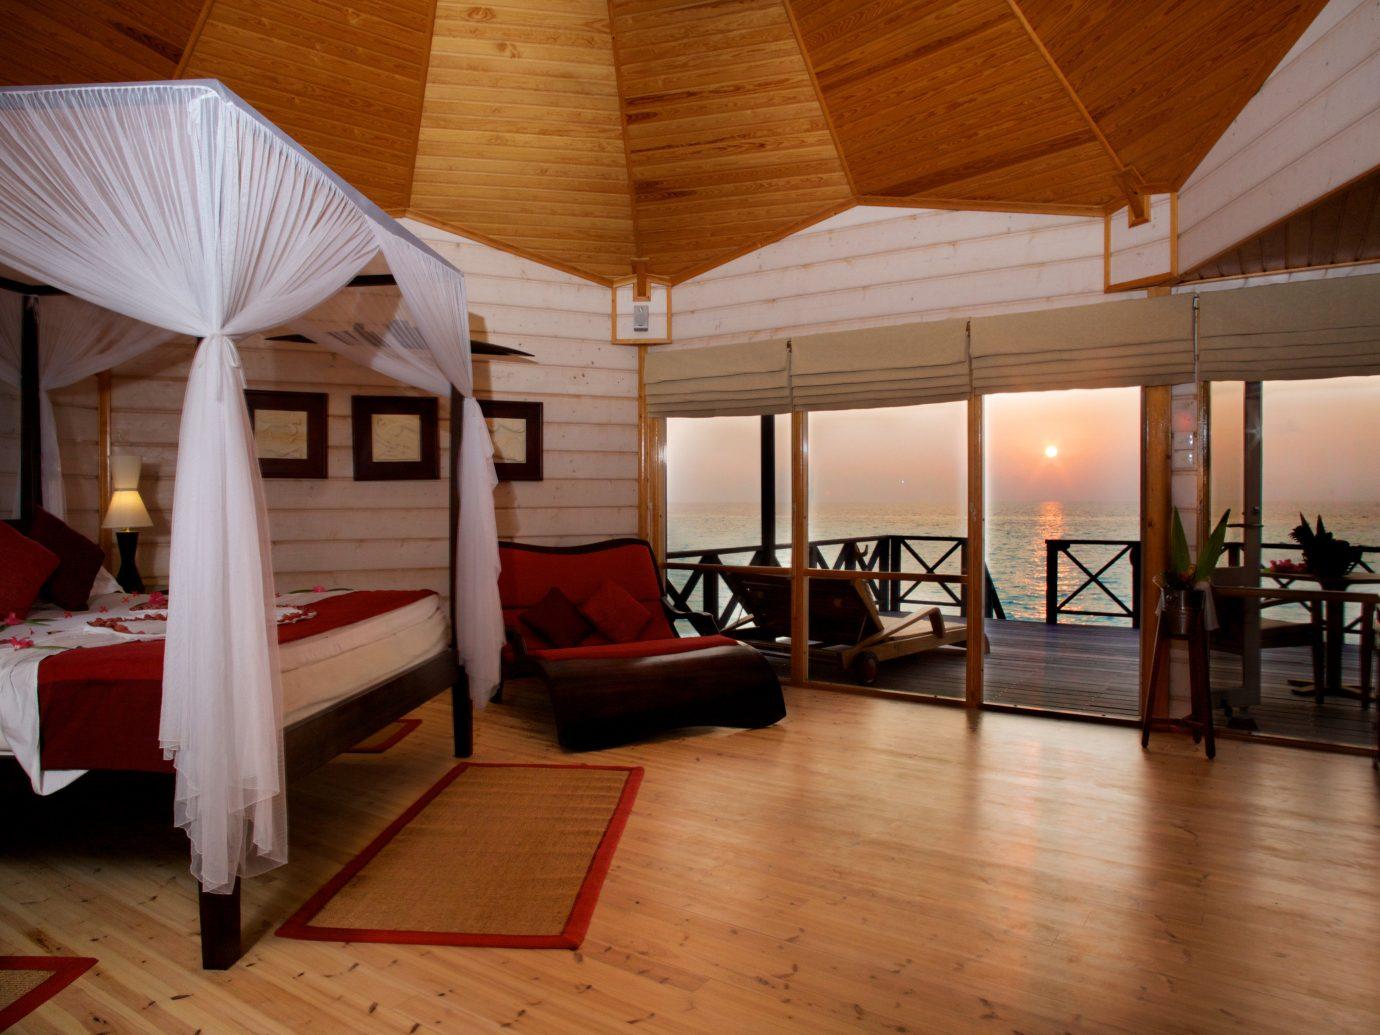 Komandoo Maldives Island Resort Bedroom Overlooking Sunset